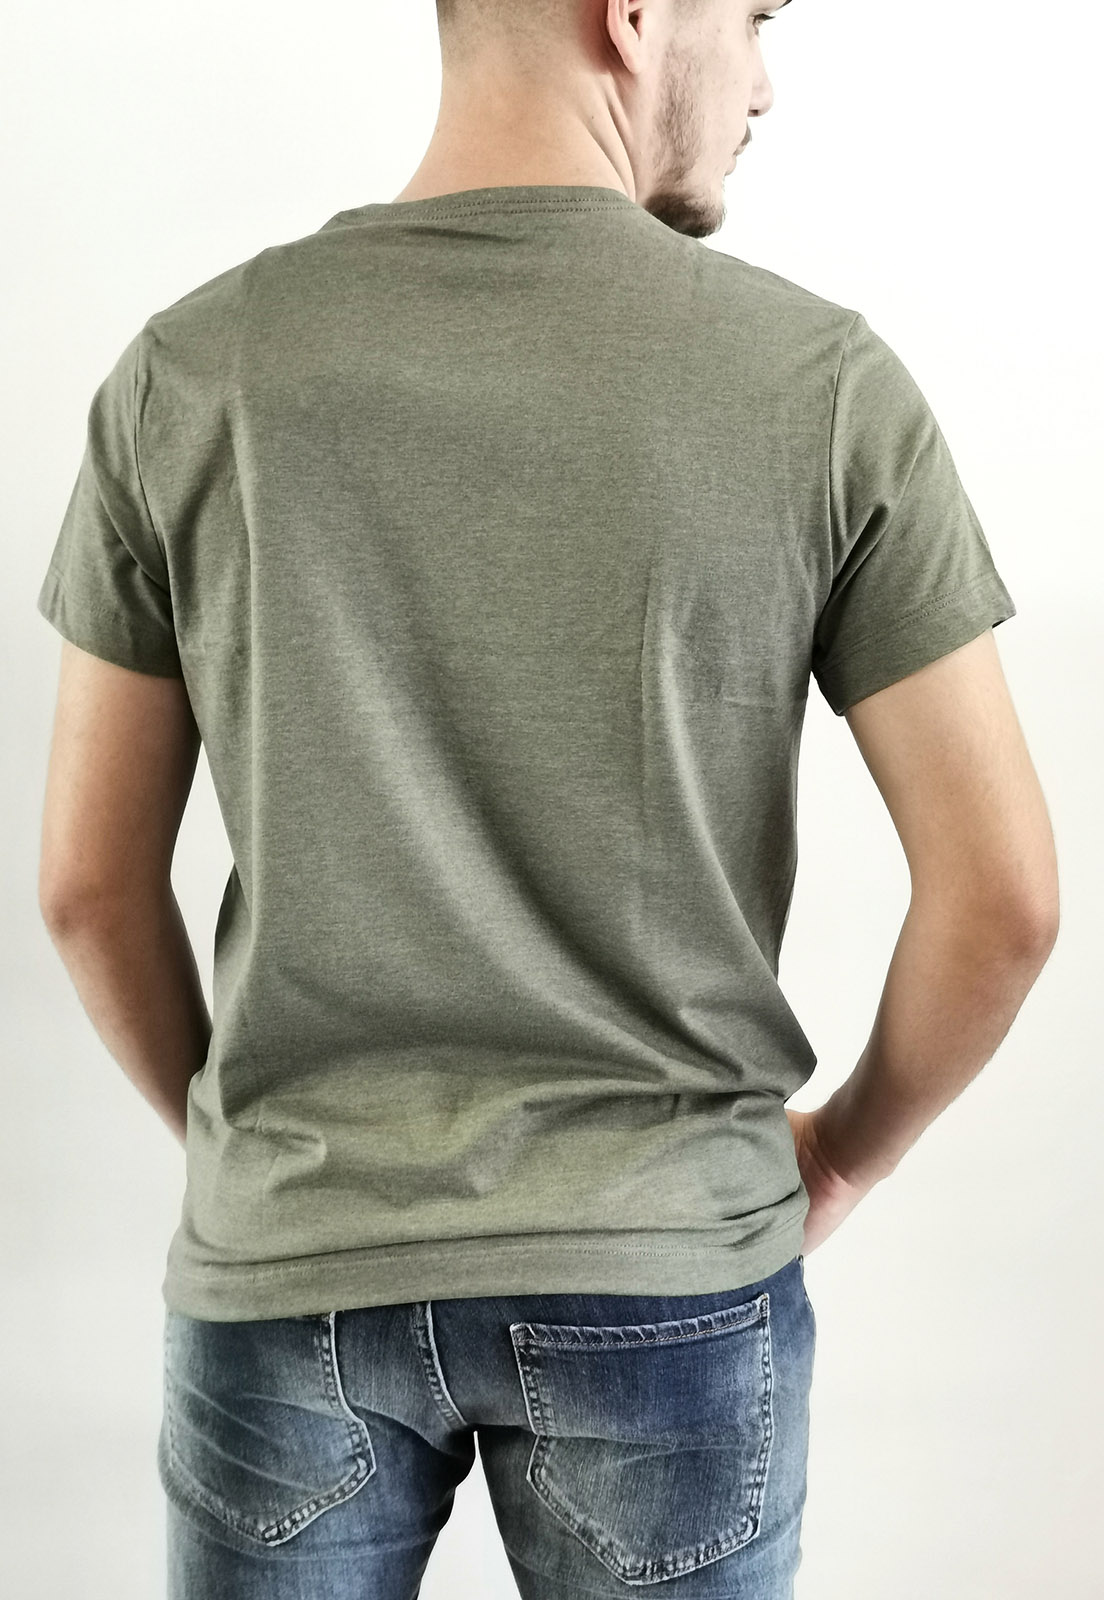 Camiseta Aéropostale Mescla Verde Básica